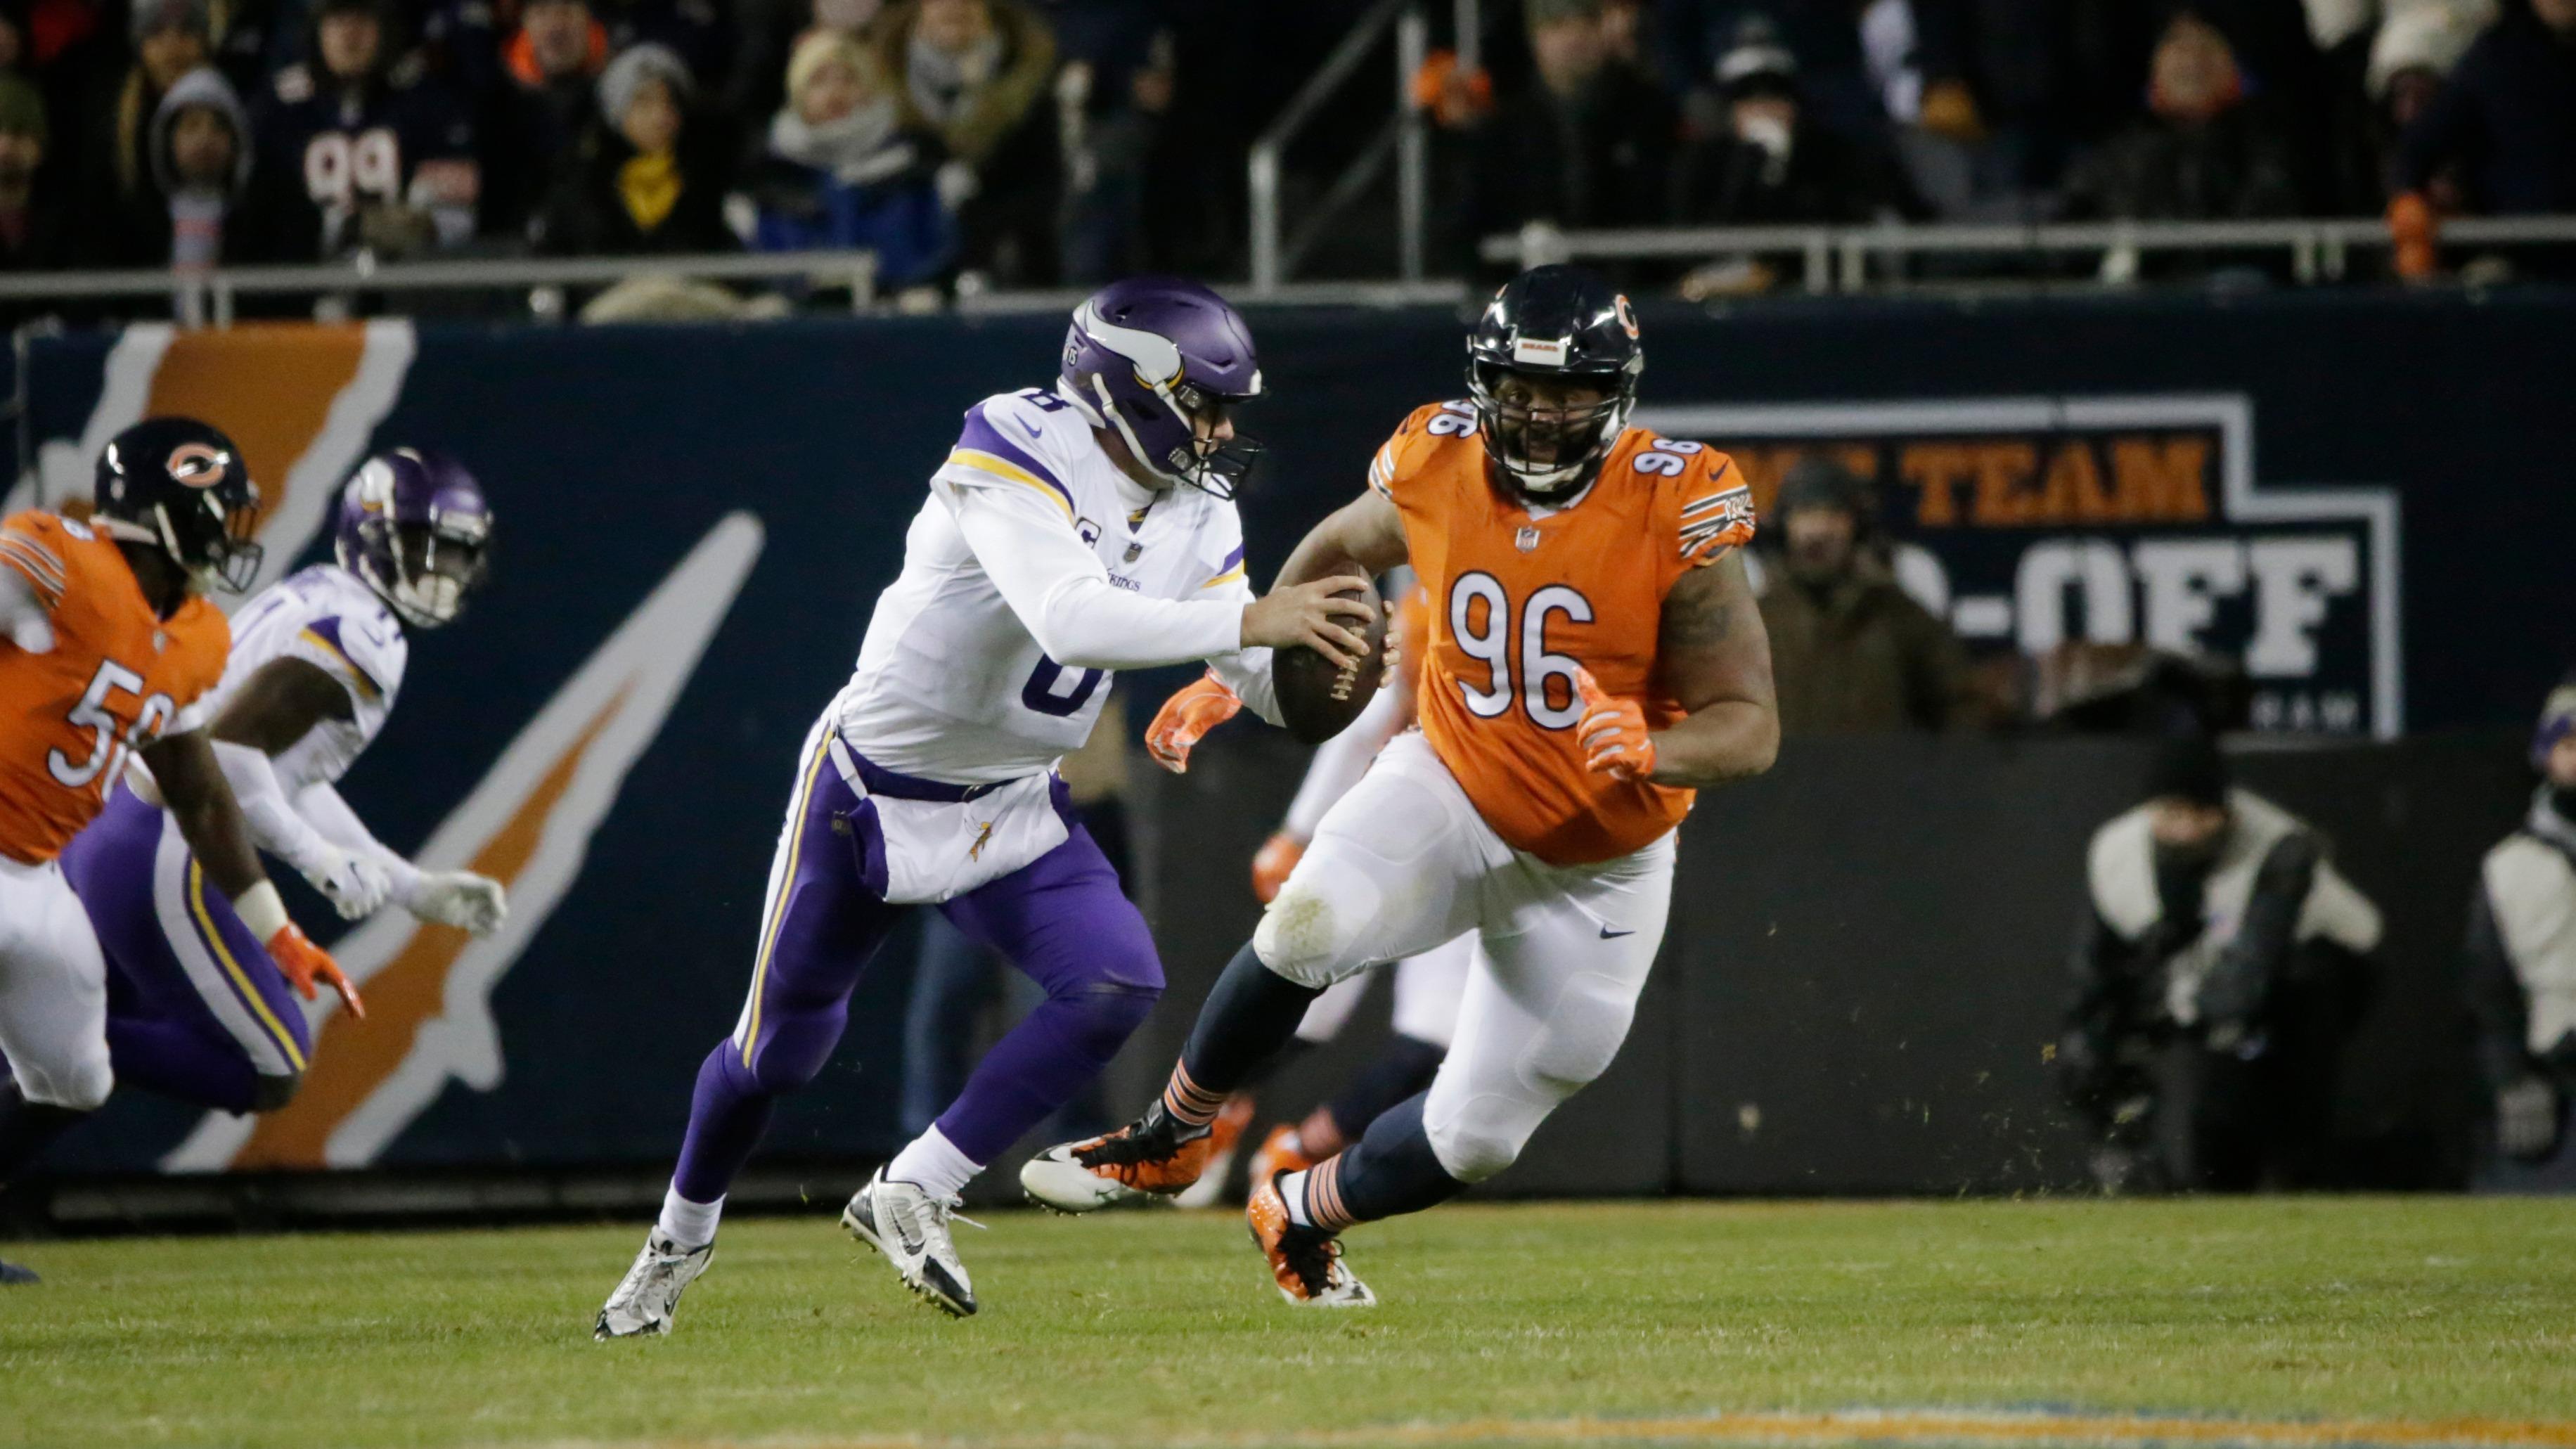 f551c7de NFL Week 17 late game rundown: Vikings, Ravens face win-and-in scenario